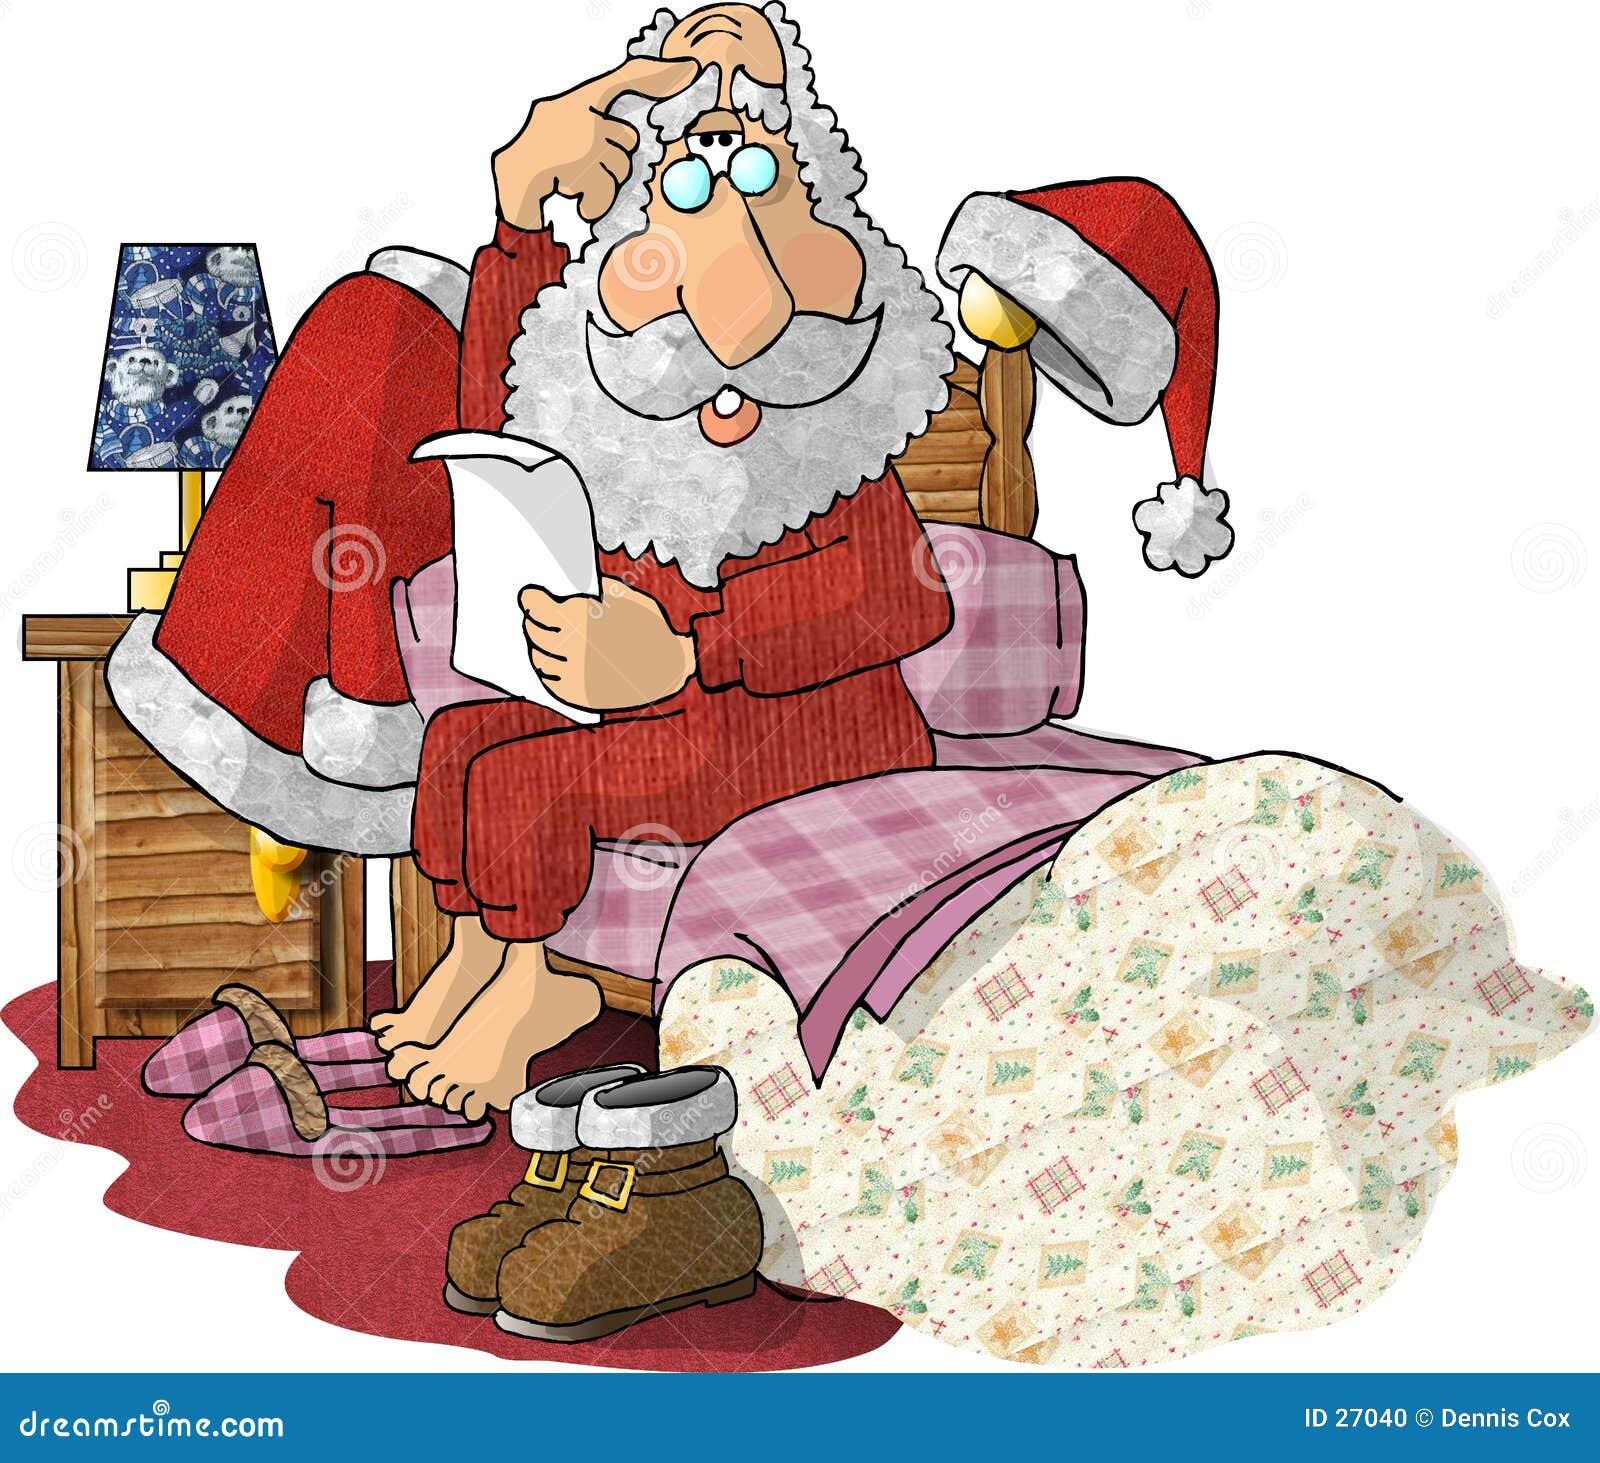 Christmas Pajamas For Men